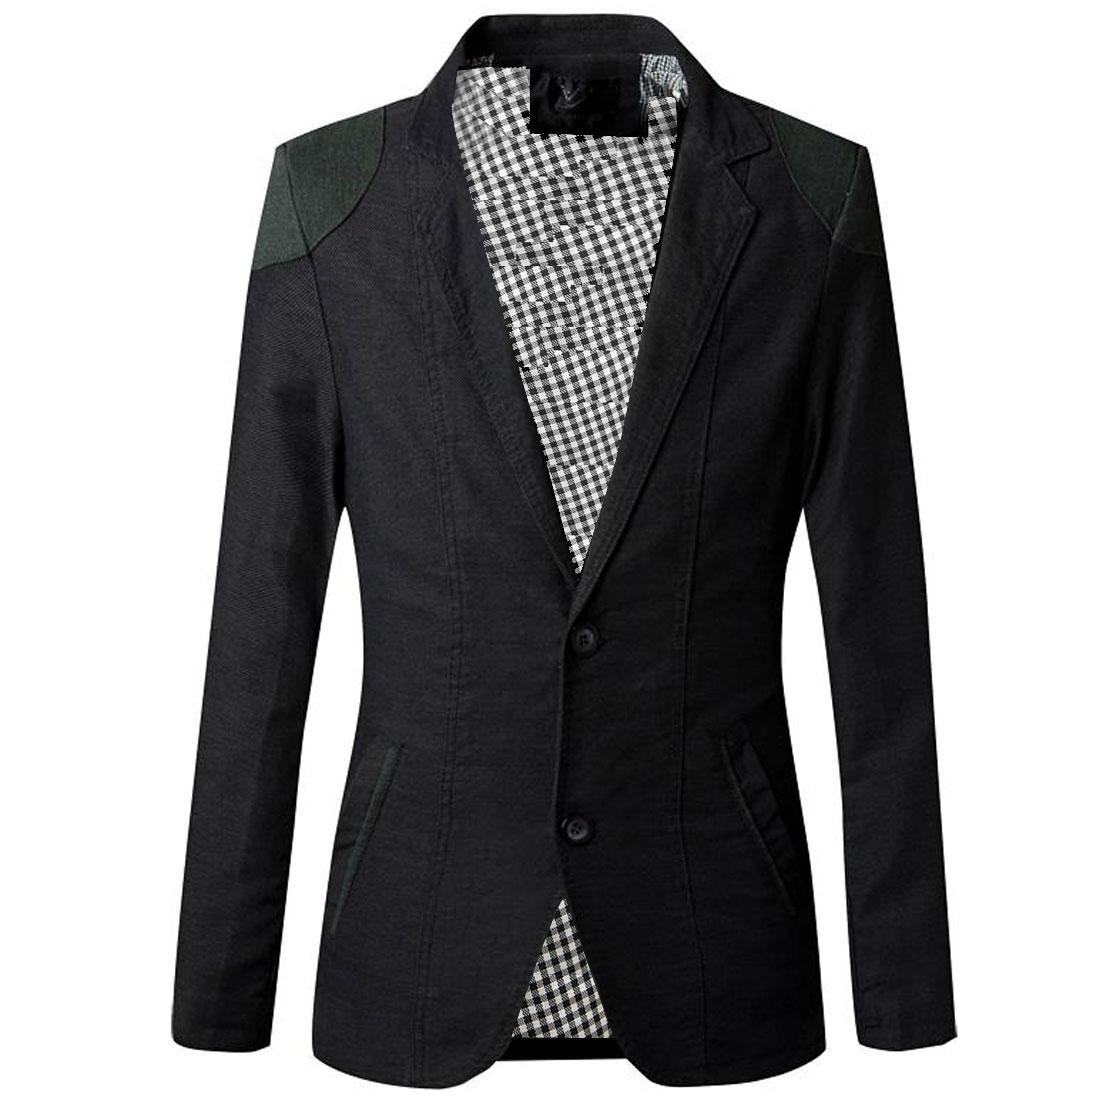 Men Two Button Long Sleeve Plaids Lining Panel Blazer Black S